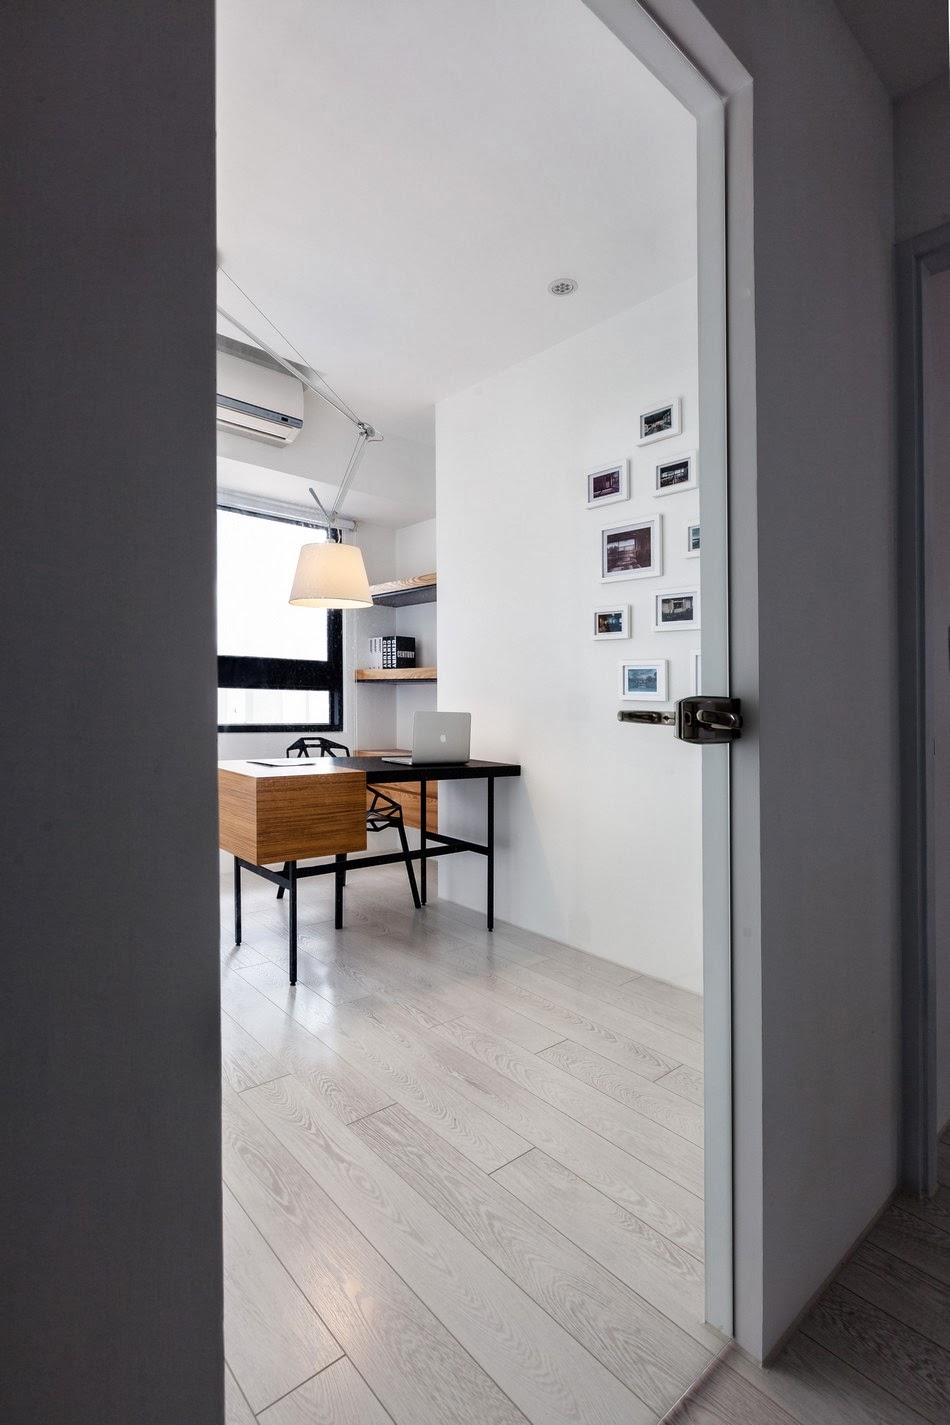 amenajari, interioare, decoratiuni, decor, design interior, minimalist, apartament, birou